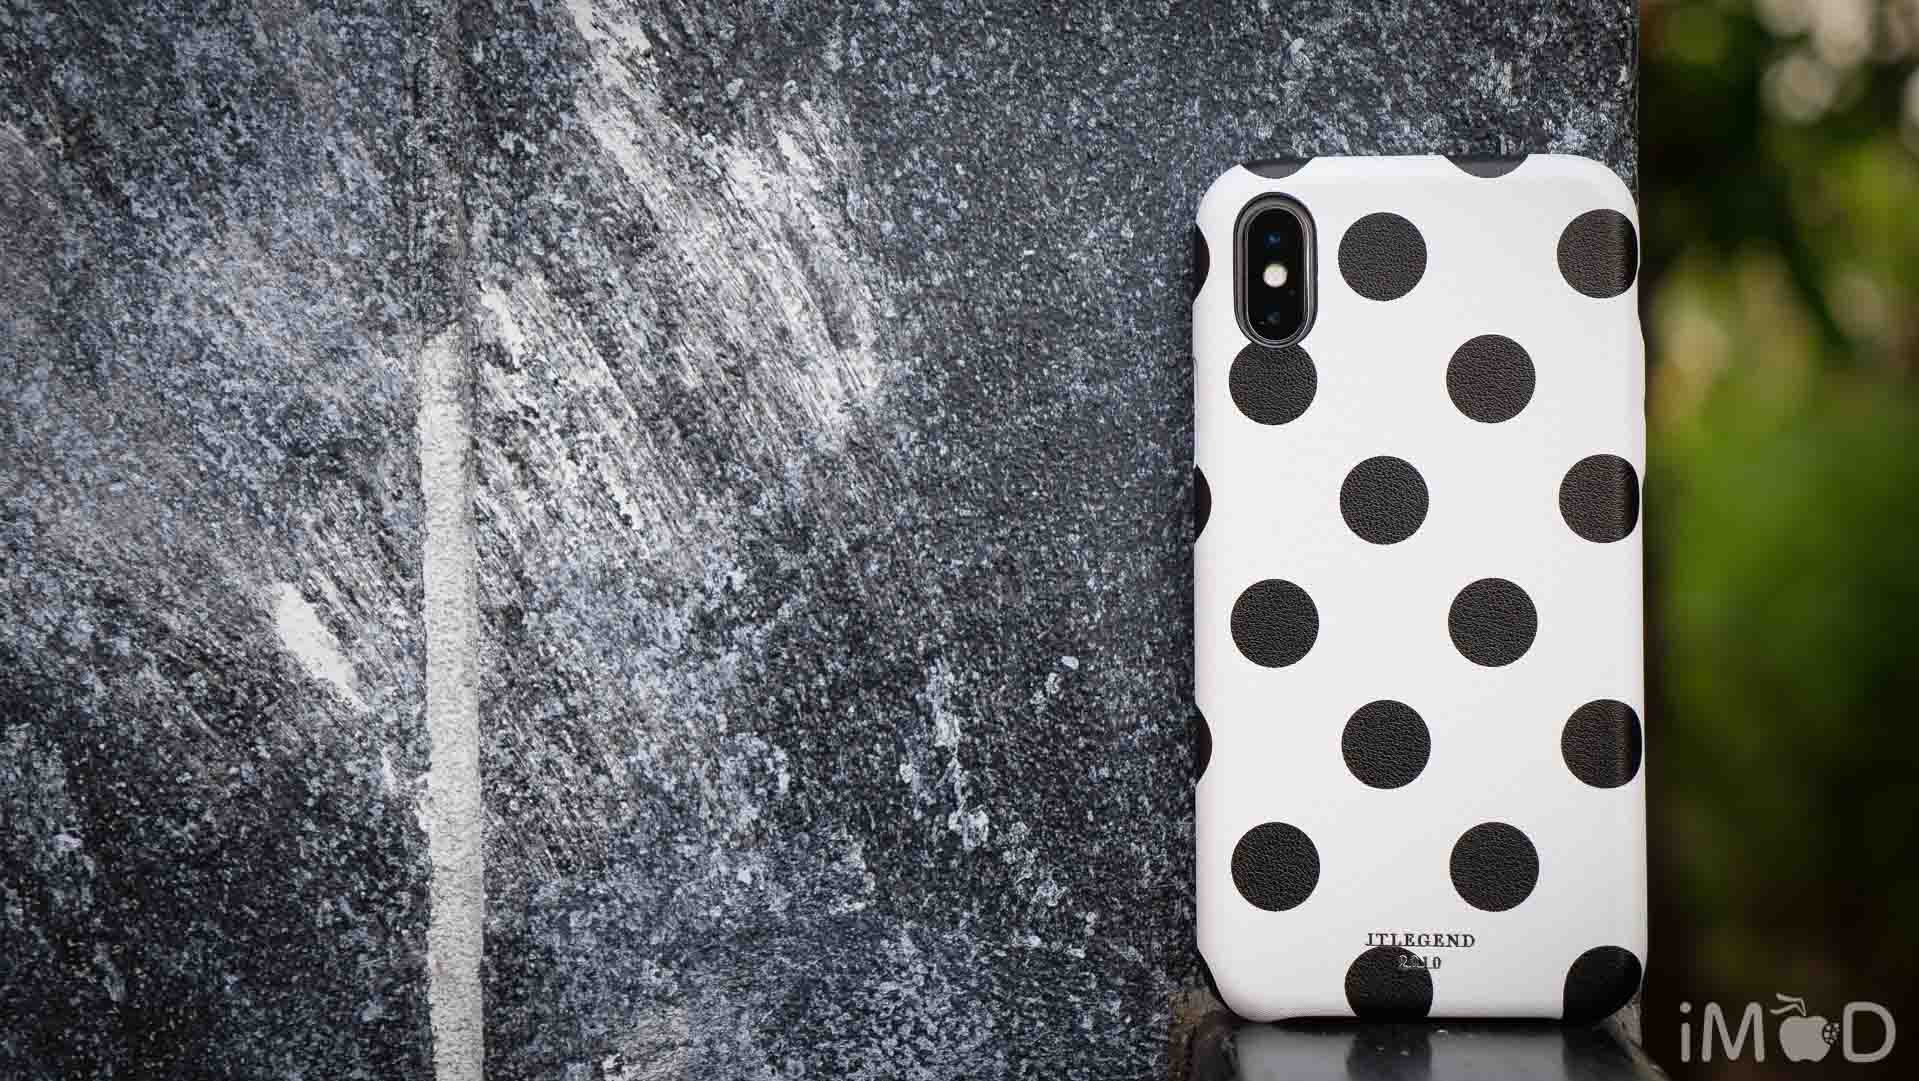 Jtlegend Pokla Leather Case Iphone X 8645